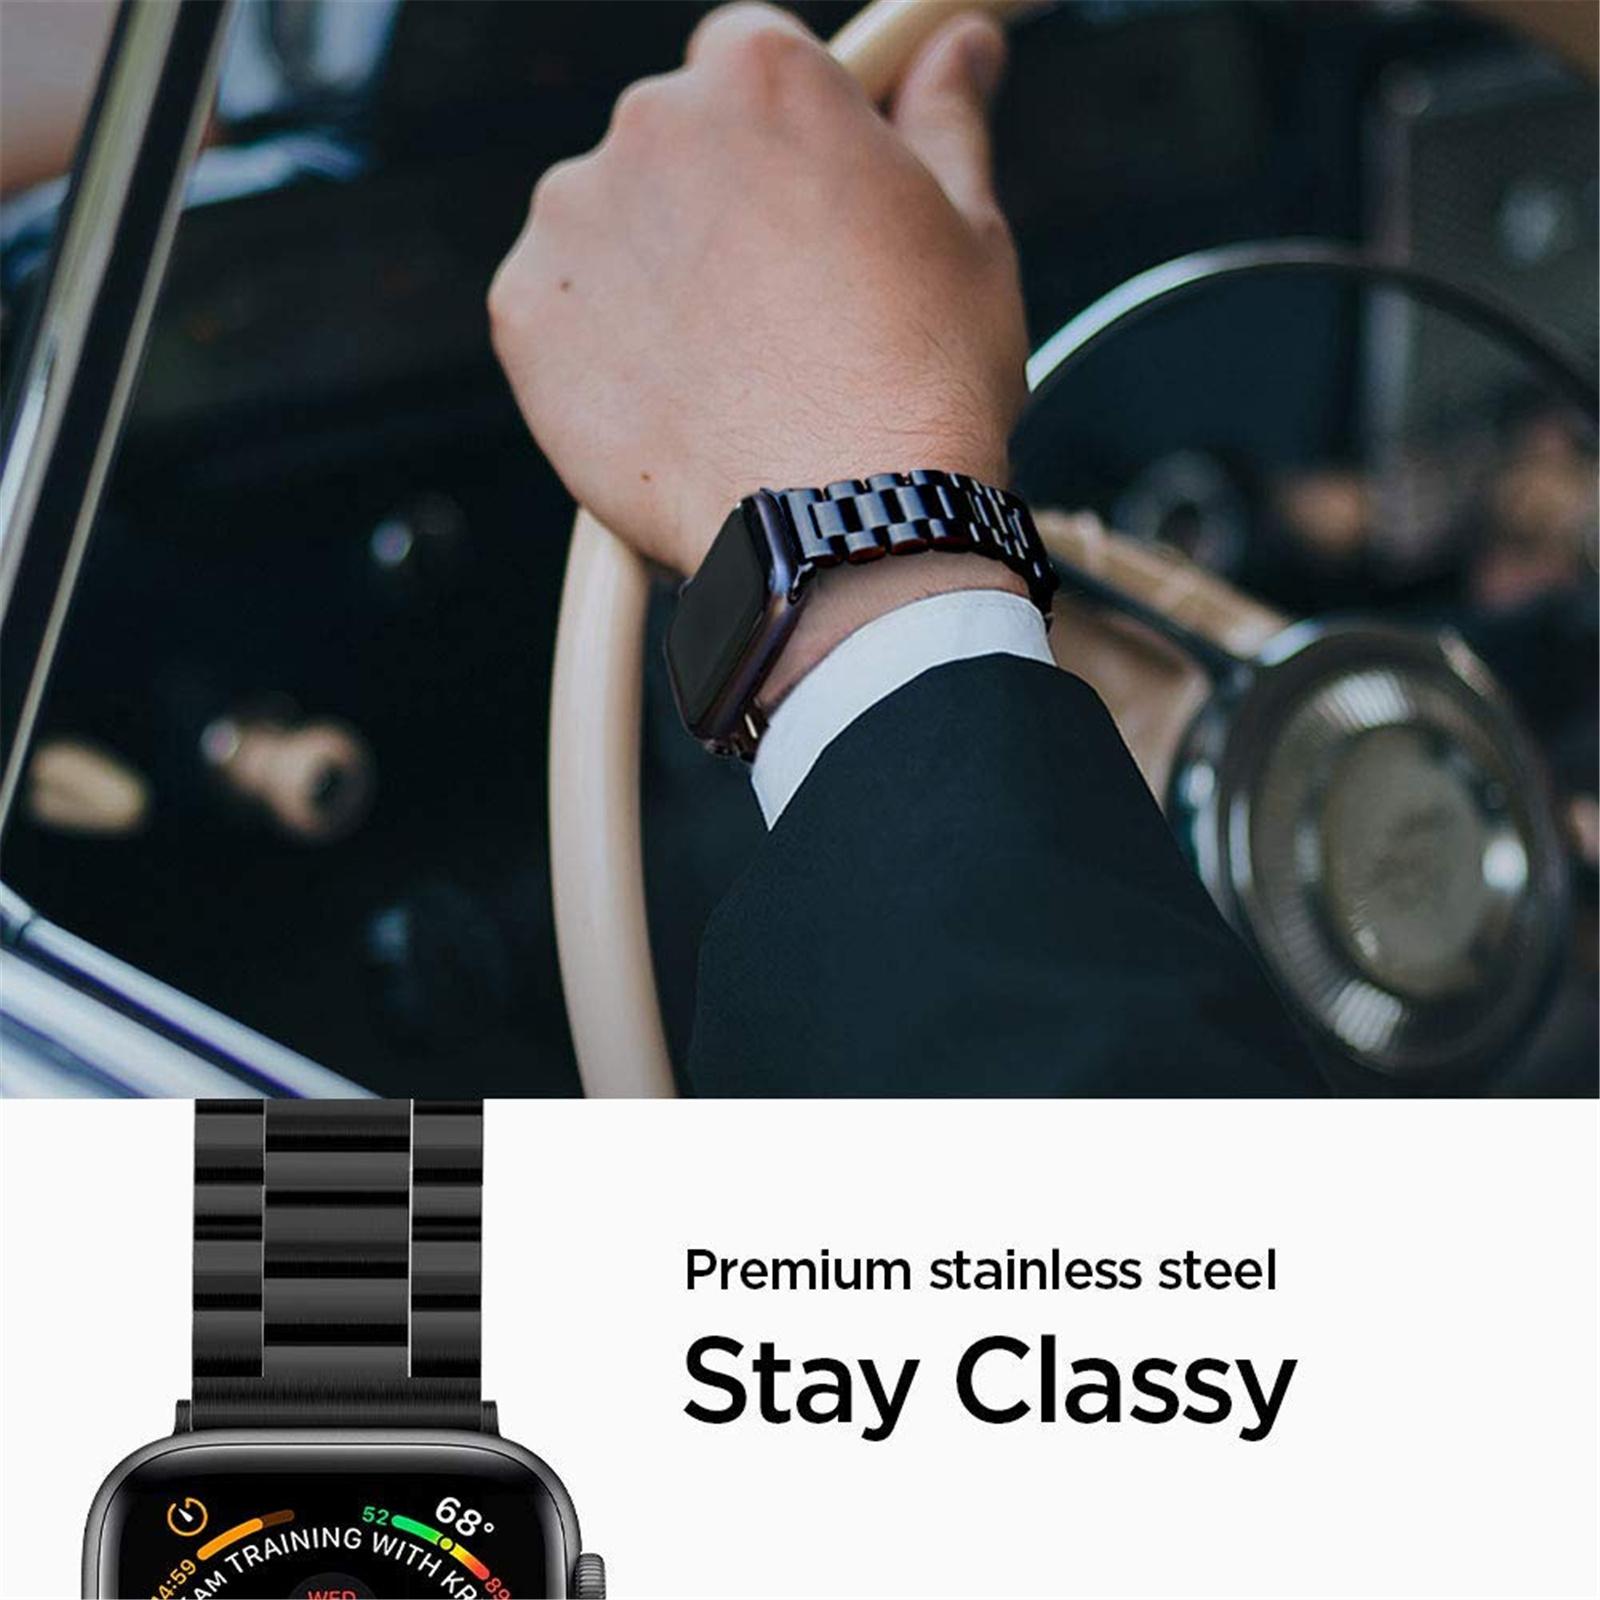 Buy the Spigen Apple Watch 44mm/42mm Premium Stainless Steel Strap - Black,... ( 062MP25403 ) online - PBTech.co.nz